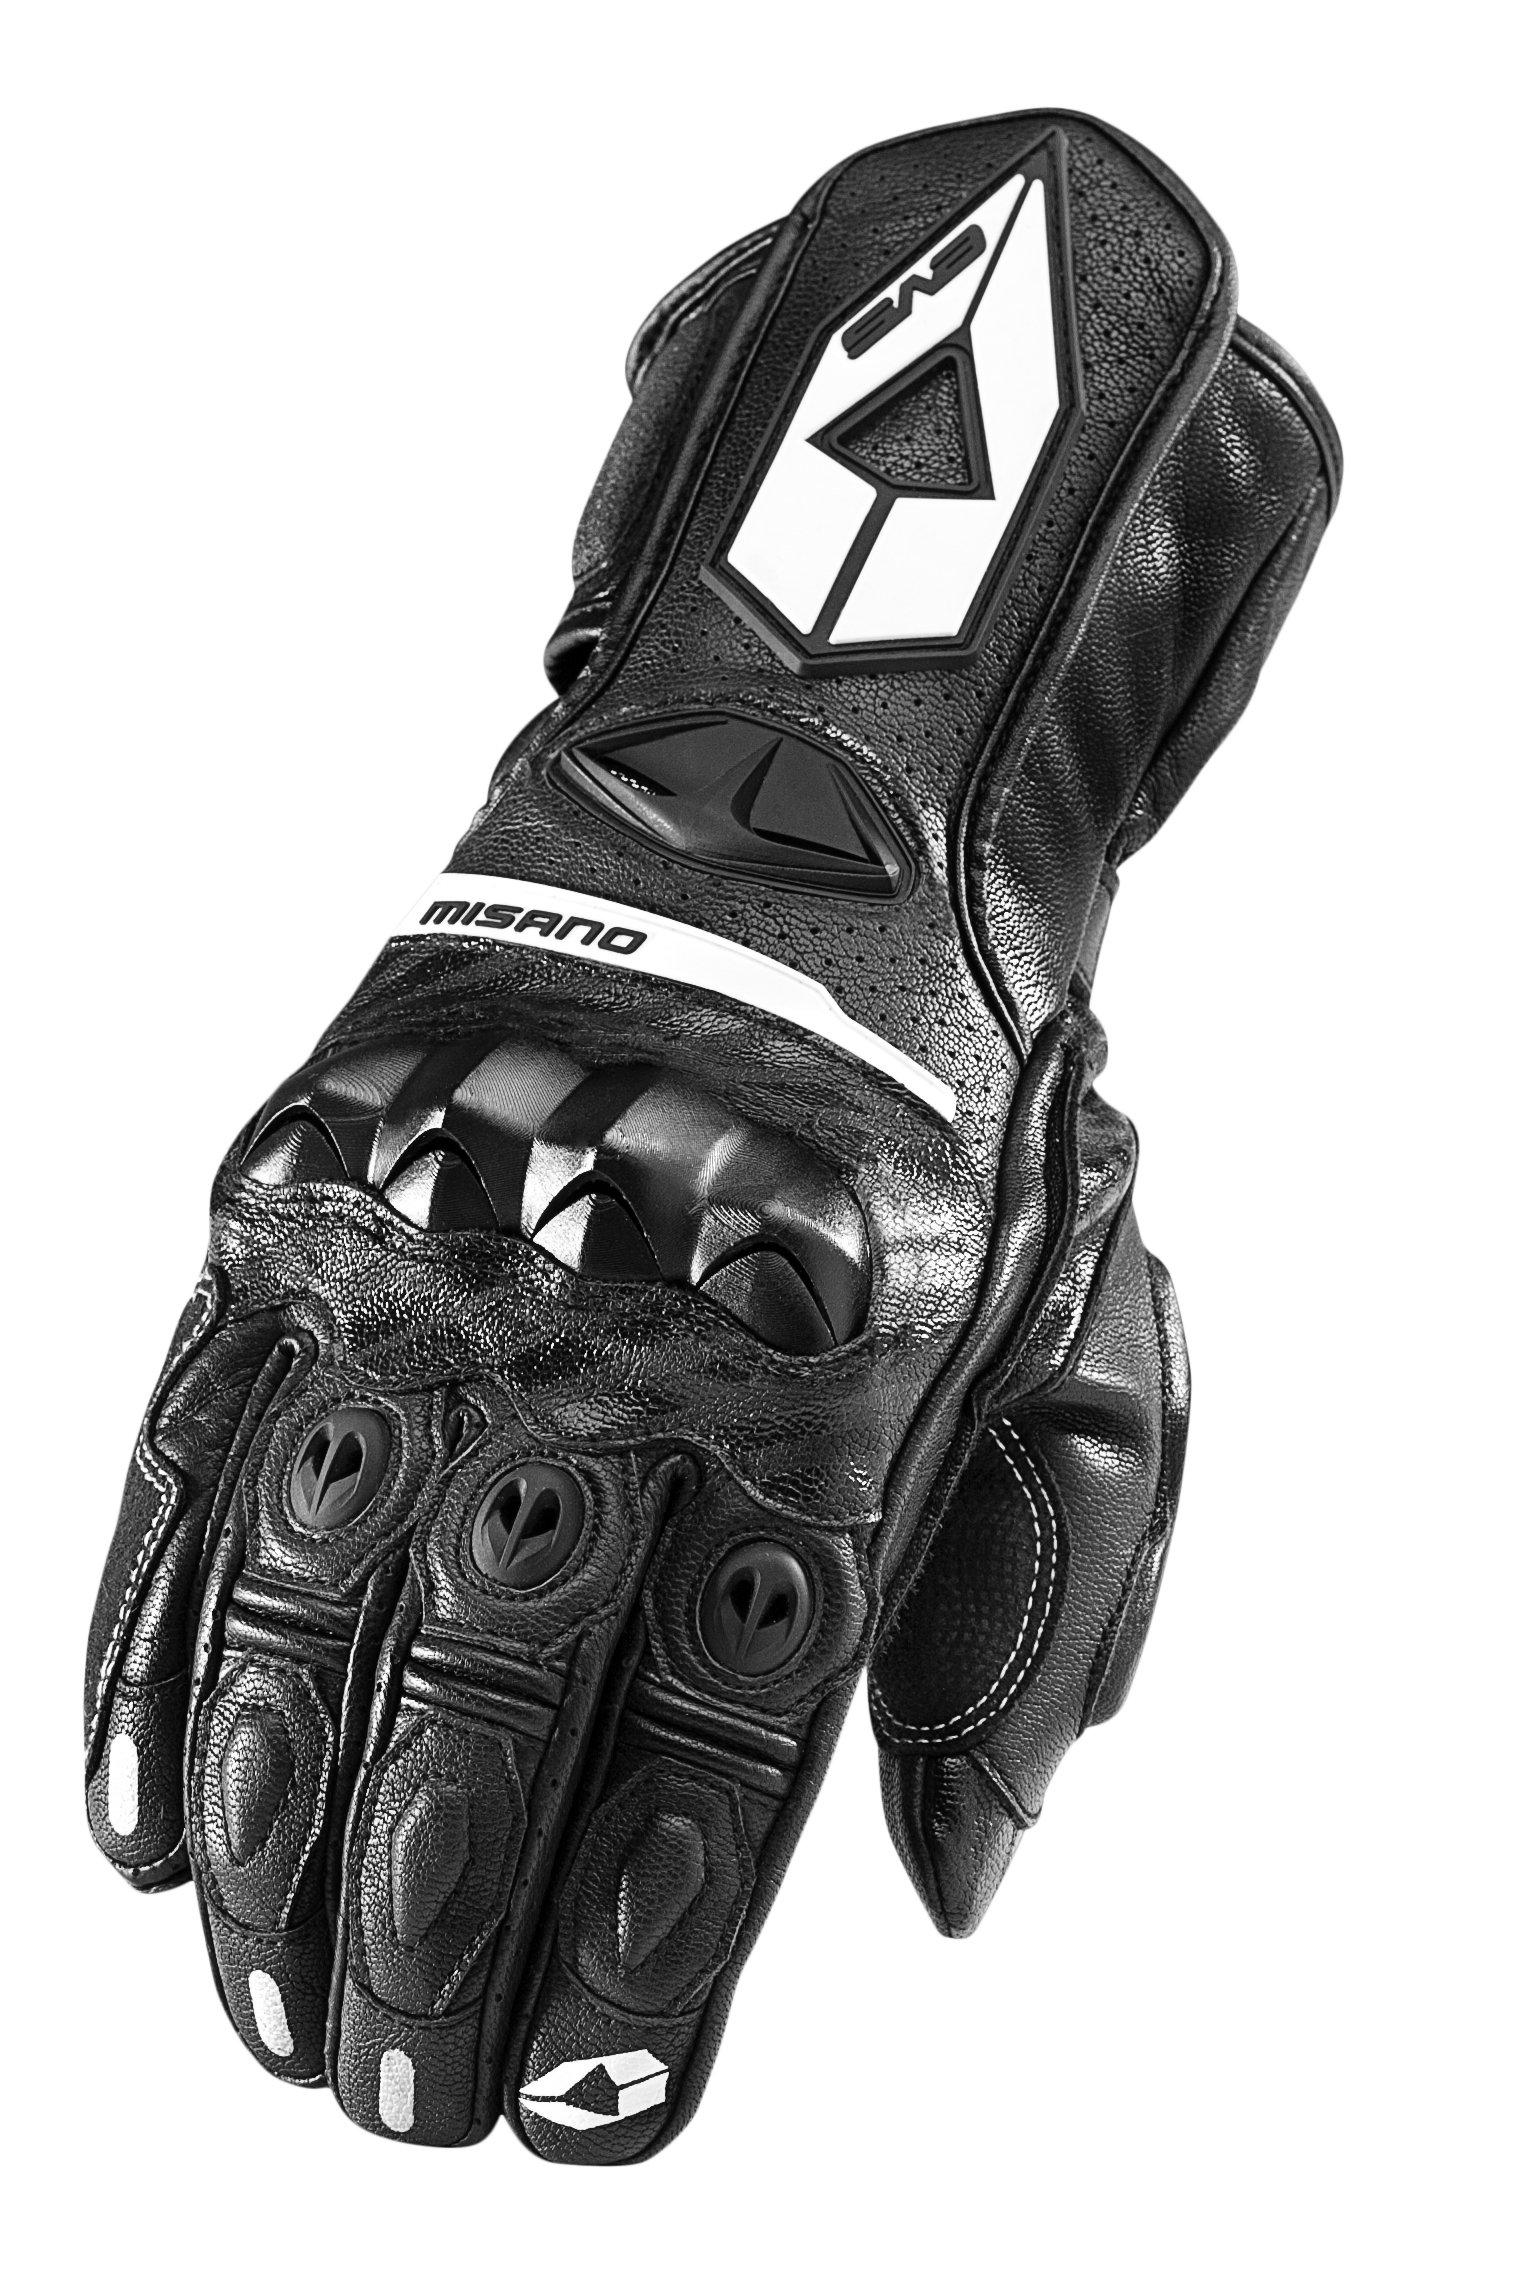 EVS Sports Misano Street Gloves (Black, Large) by EVS Sports